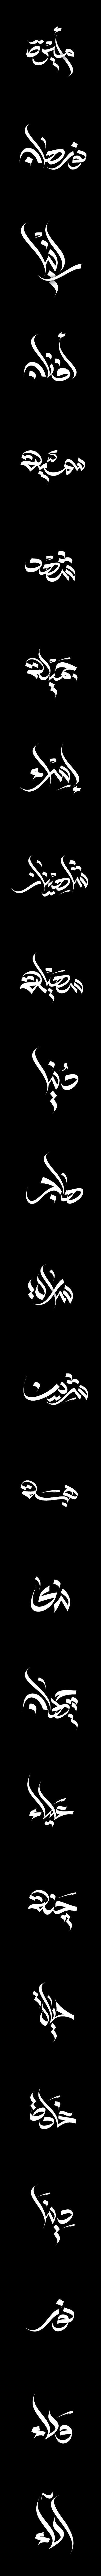 100 arabic names calligraphy  100 اسم عربي بالخط الحر